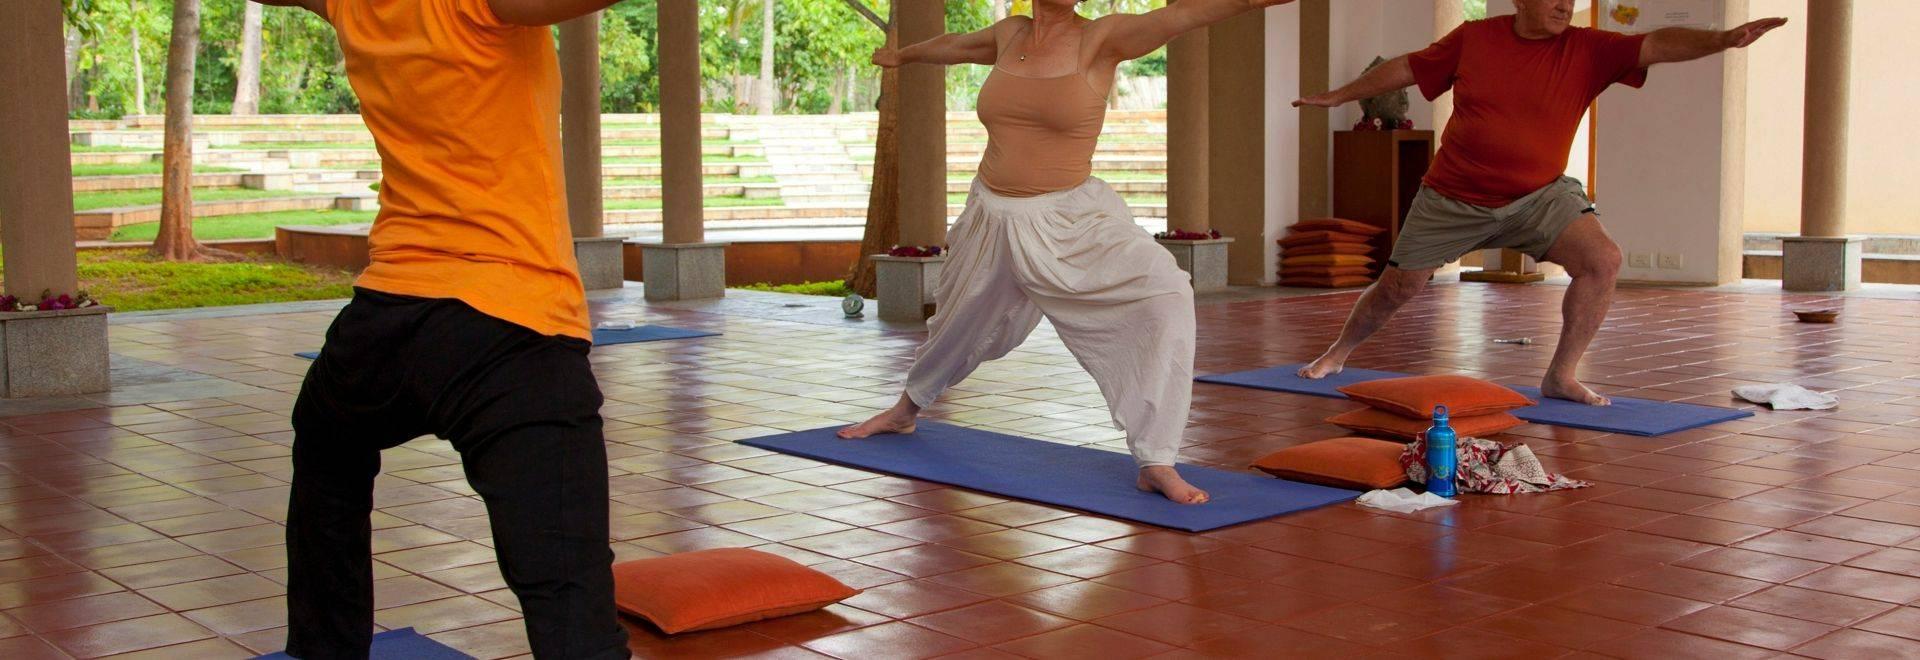 Shreyas-yoga-class-indoor.jpg